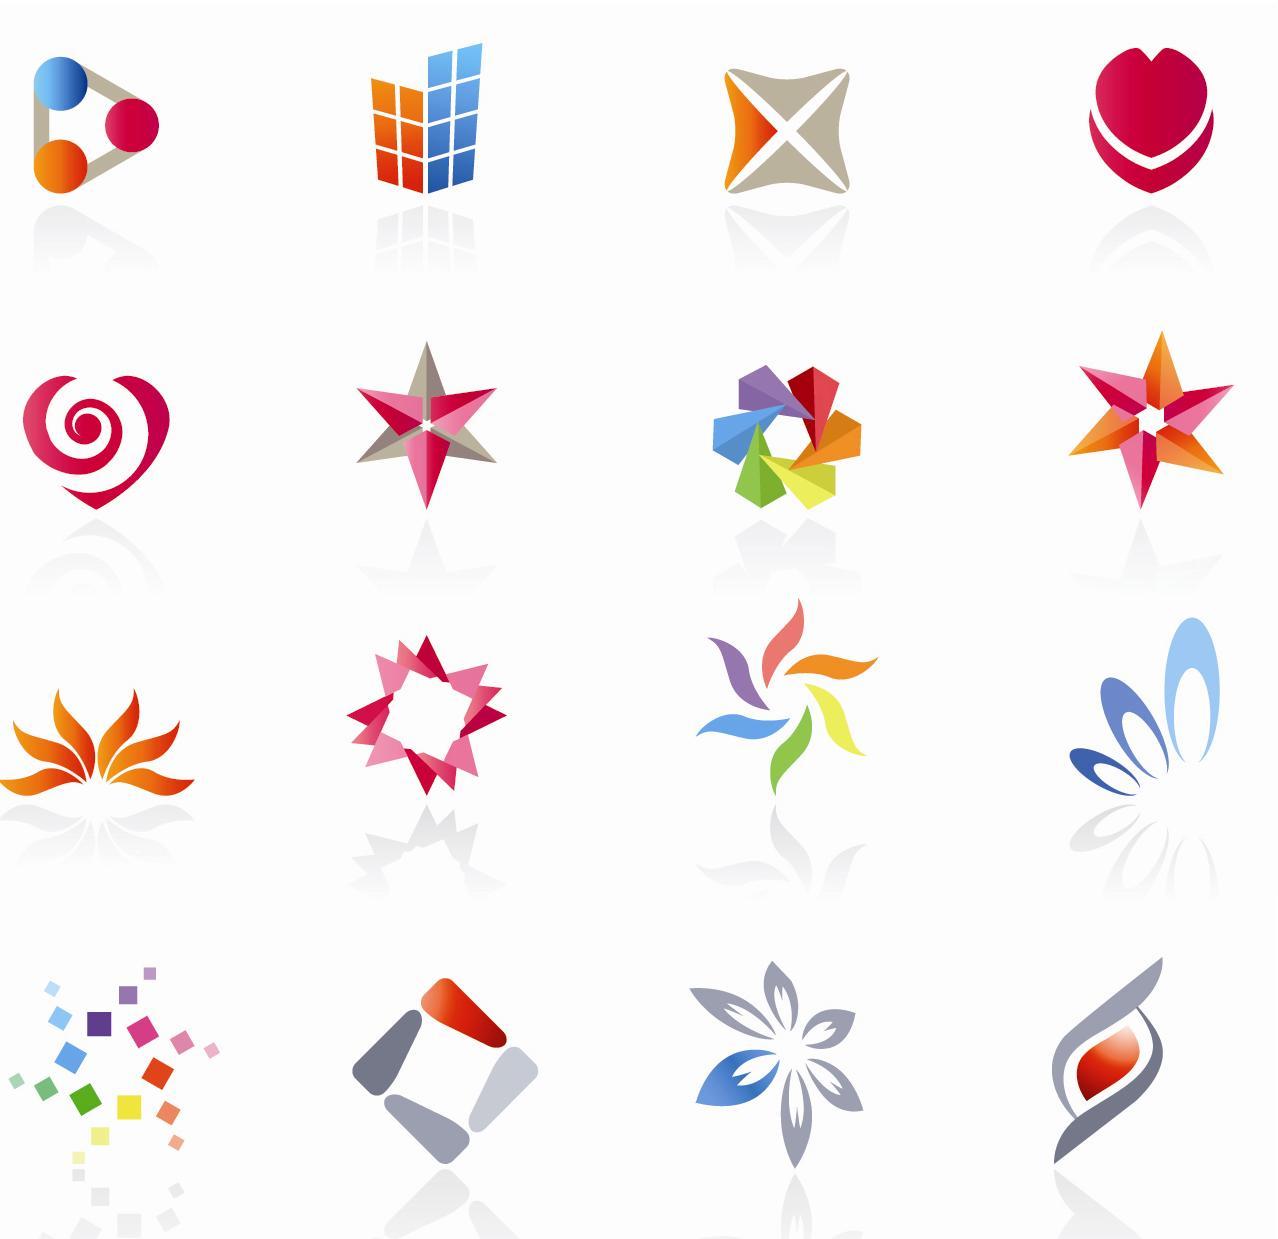 Emejing Logo Design Ideas For Business Gallery - Interior Design ...